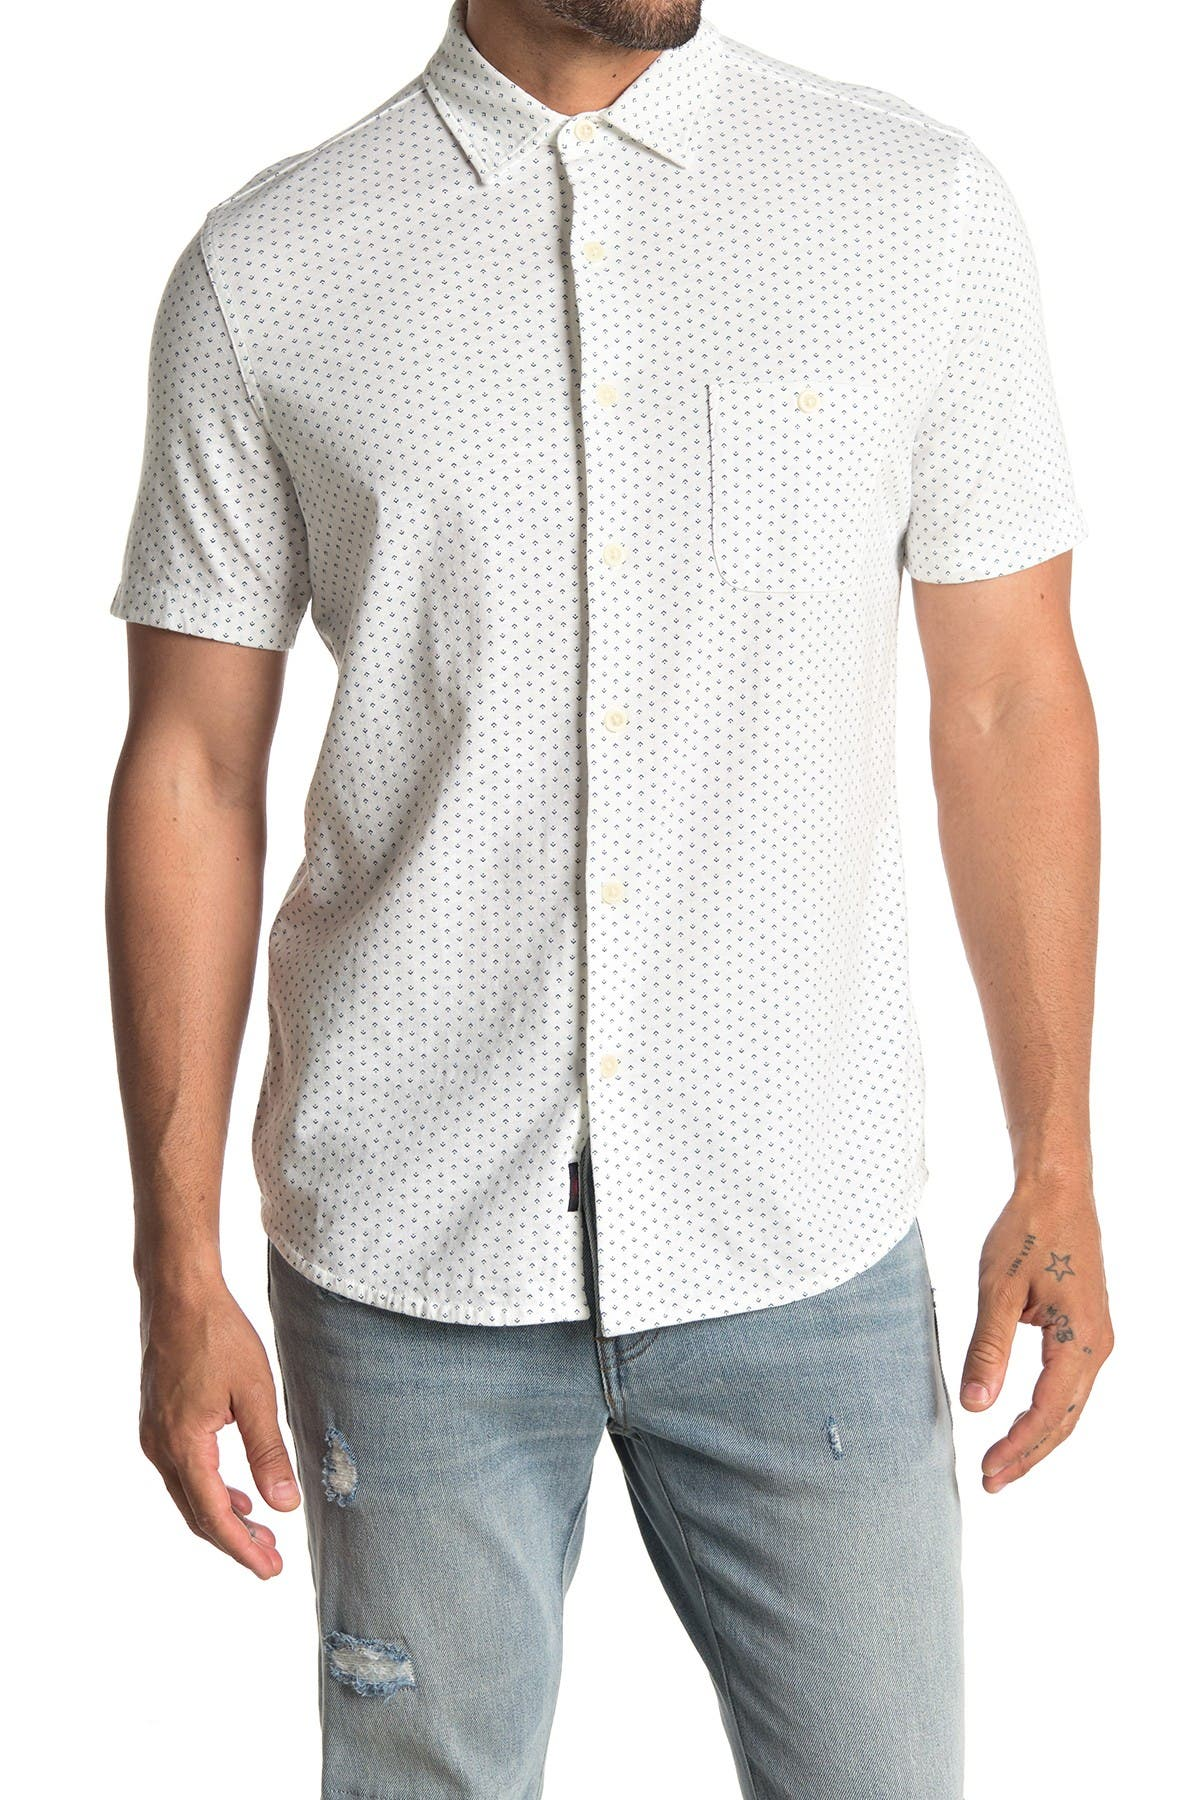 Image of FAHERTY BRAND Knit Coast Short Sleeve Dobby Slim Fit Shirt